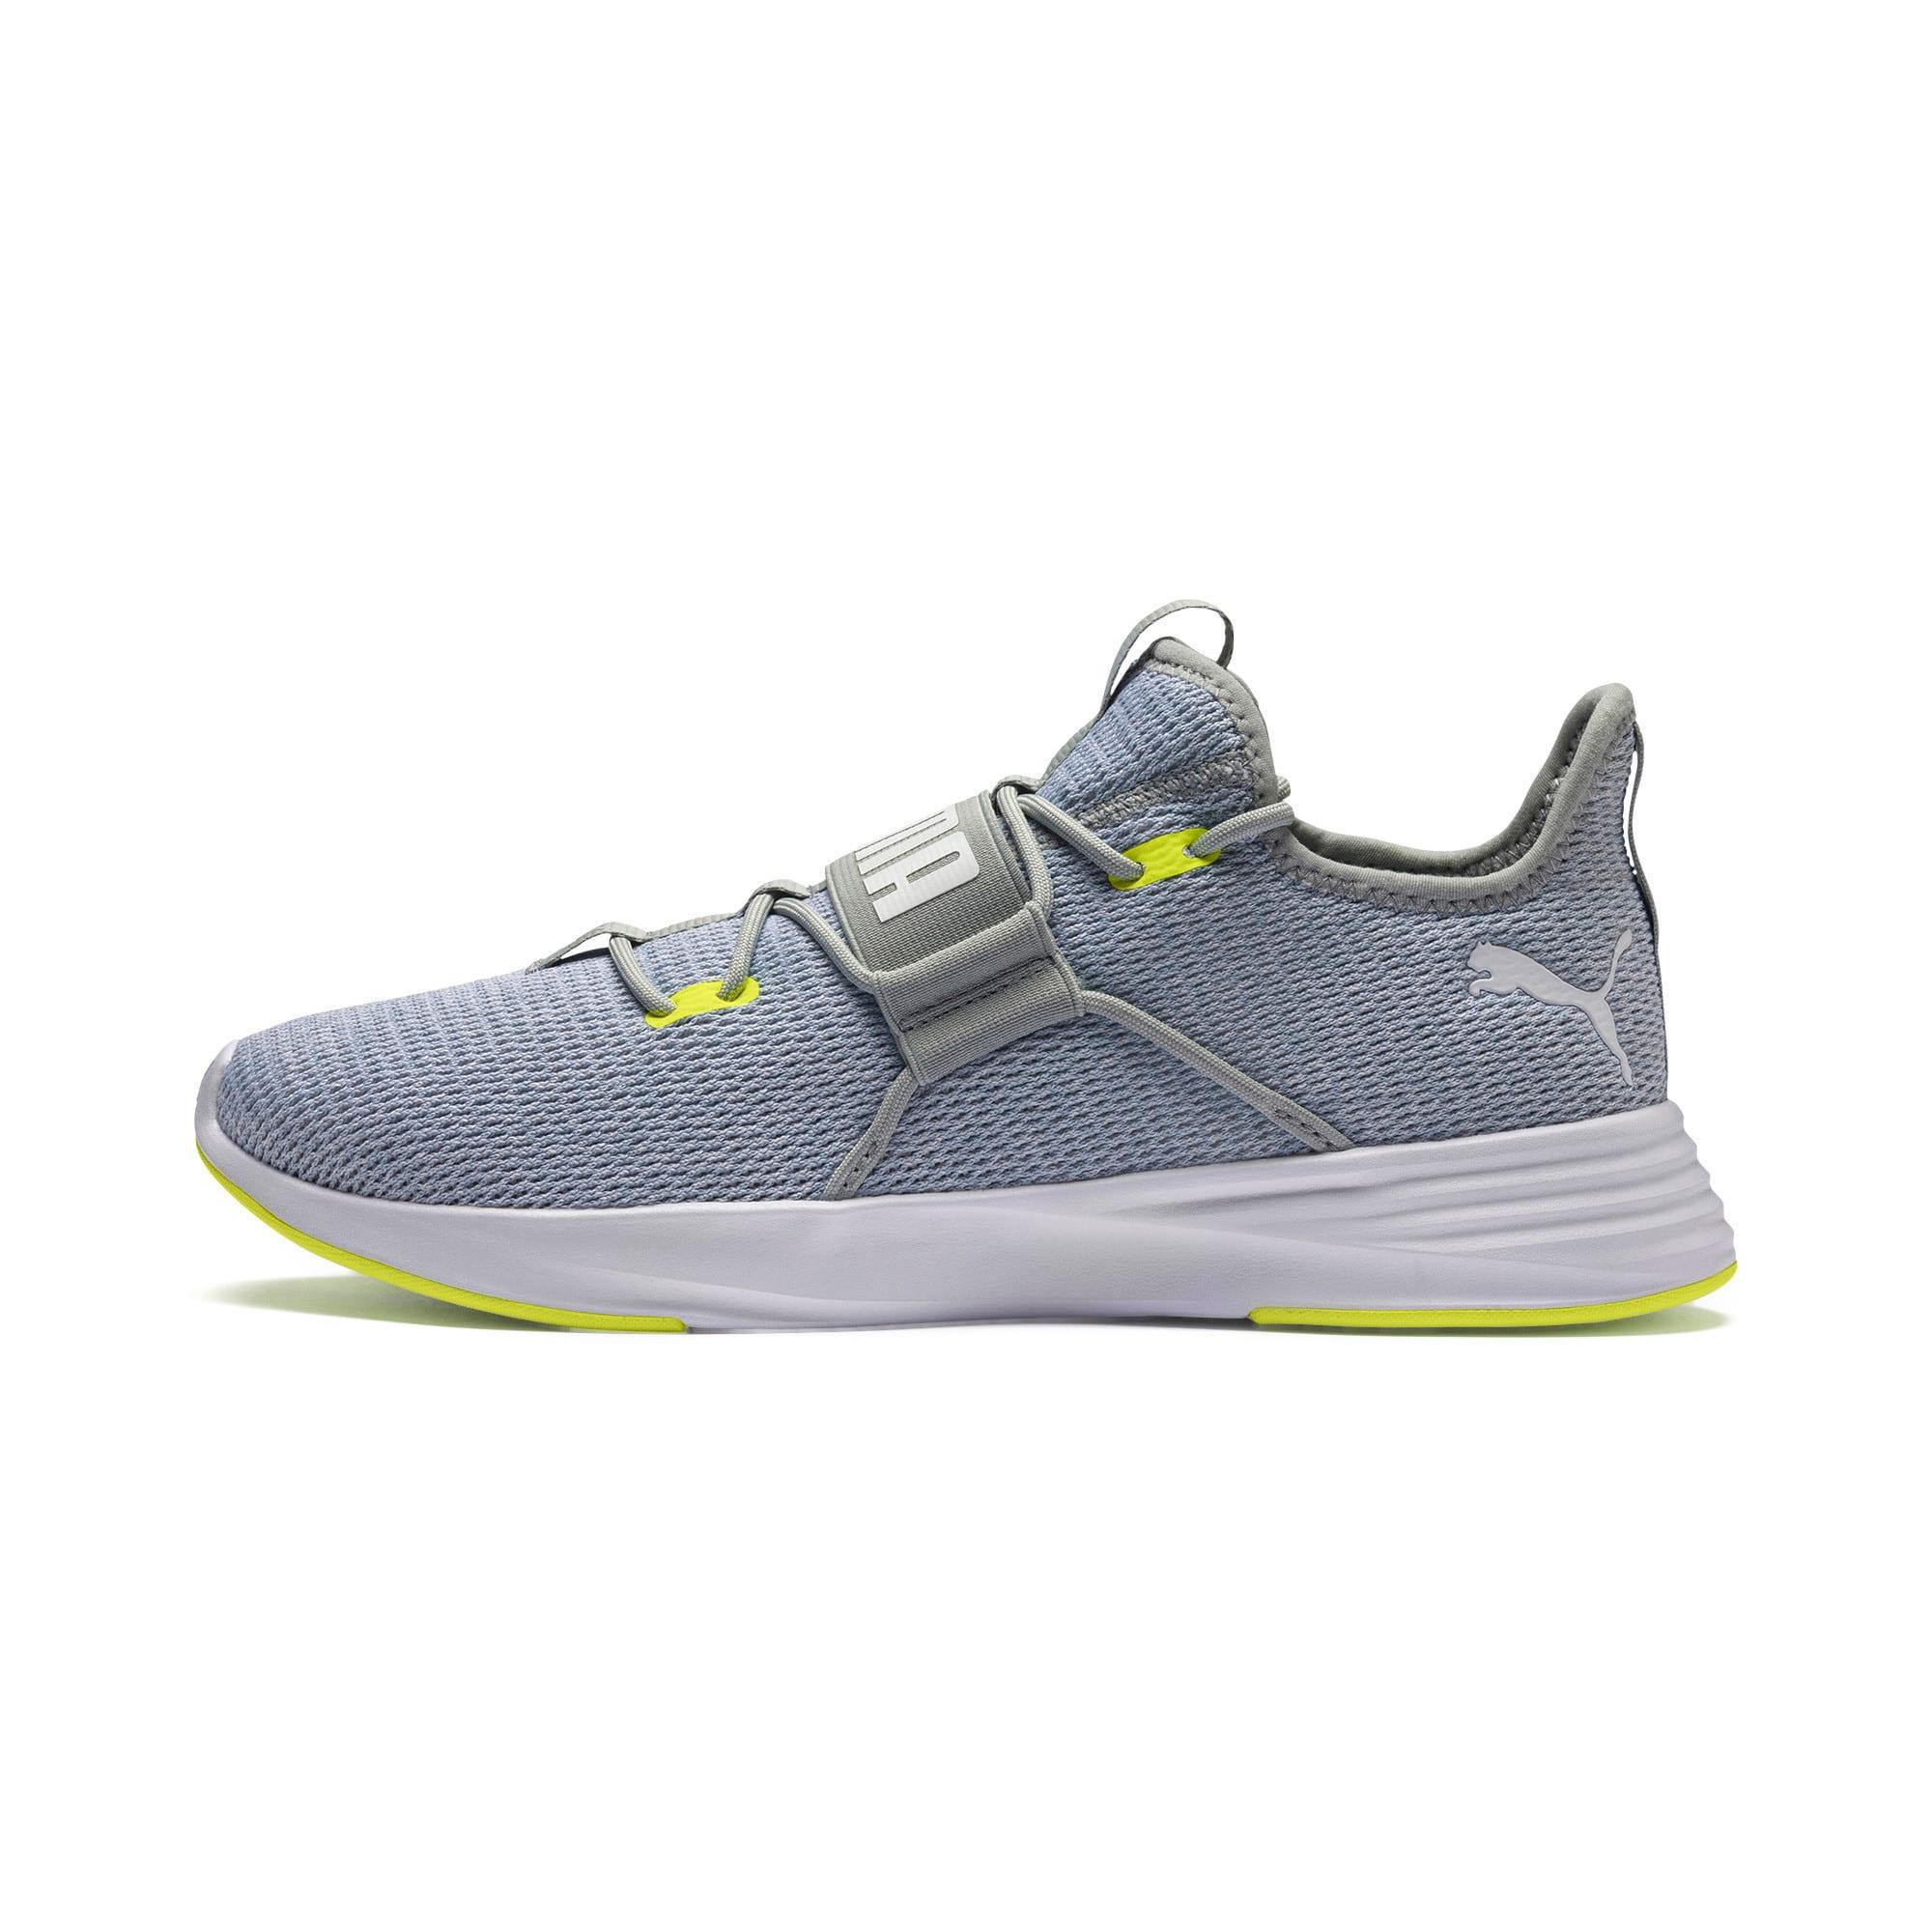 Thumbnail 1 of Persist XT Men's Training Shoes, Quarry-Fizzy Yellow-White, medium